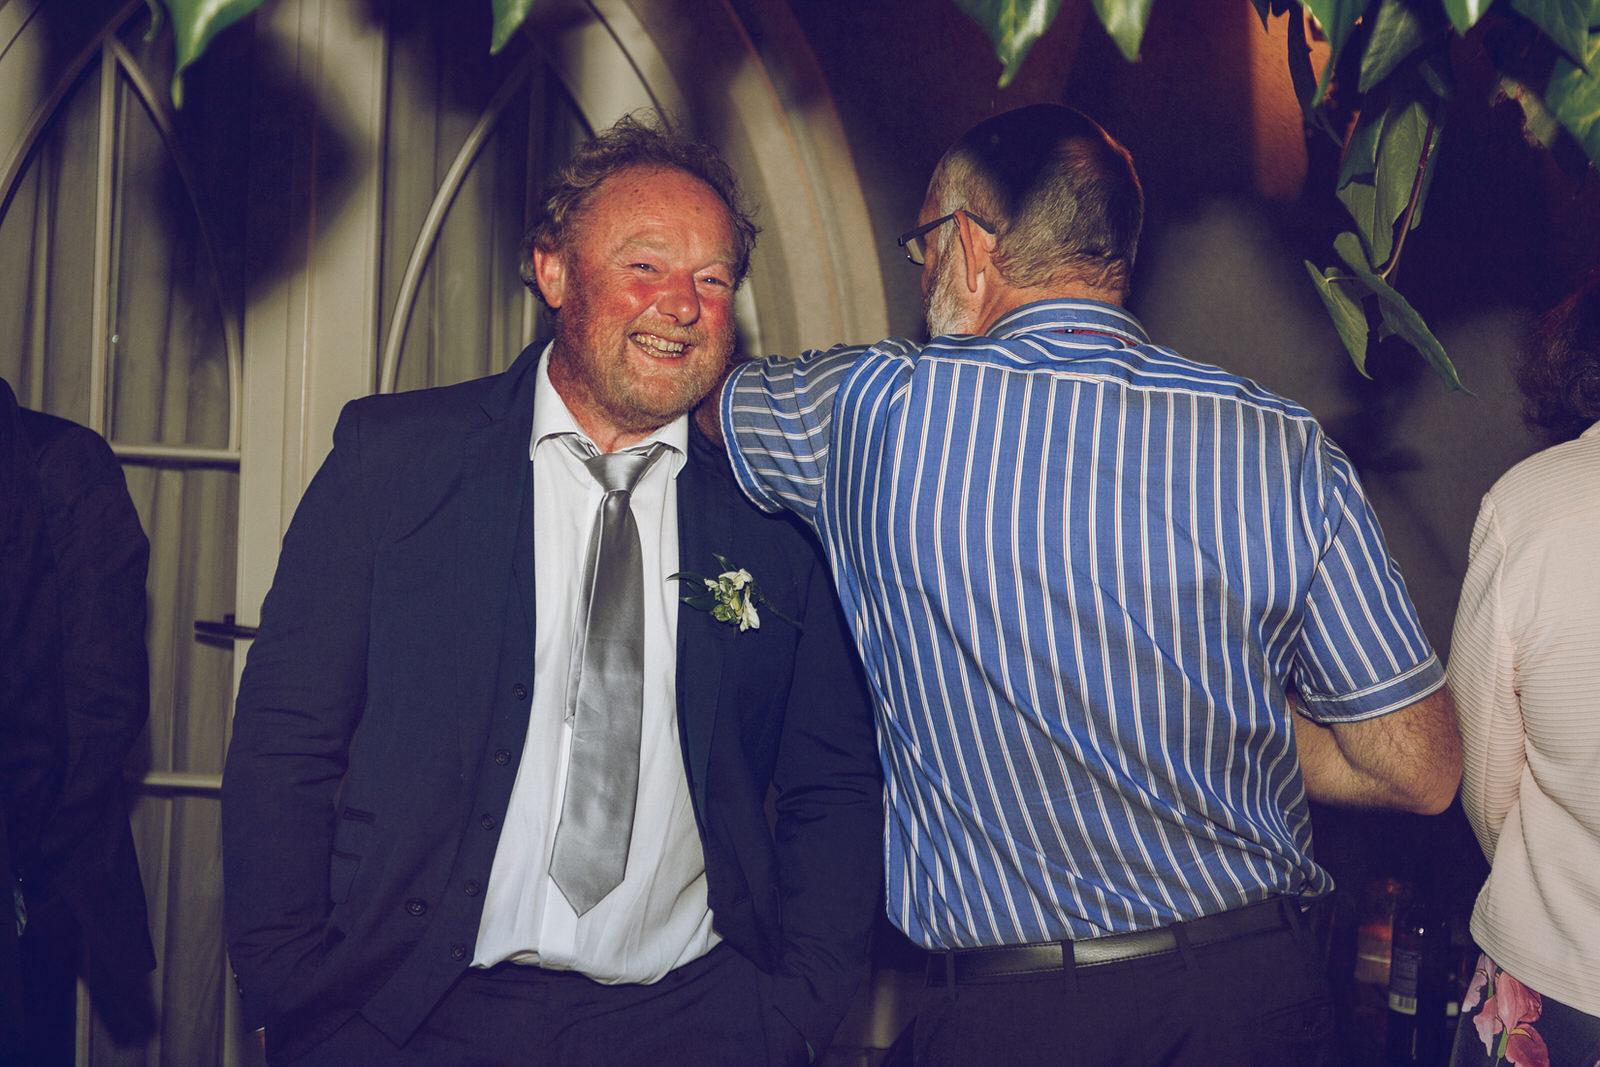 Brooklodge-wicklow-wedding-photographer_141.jpg